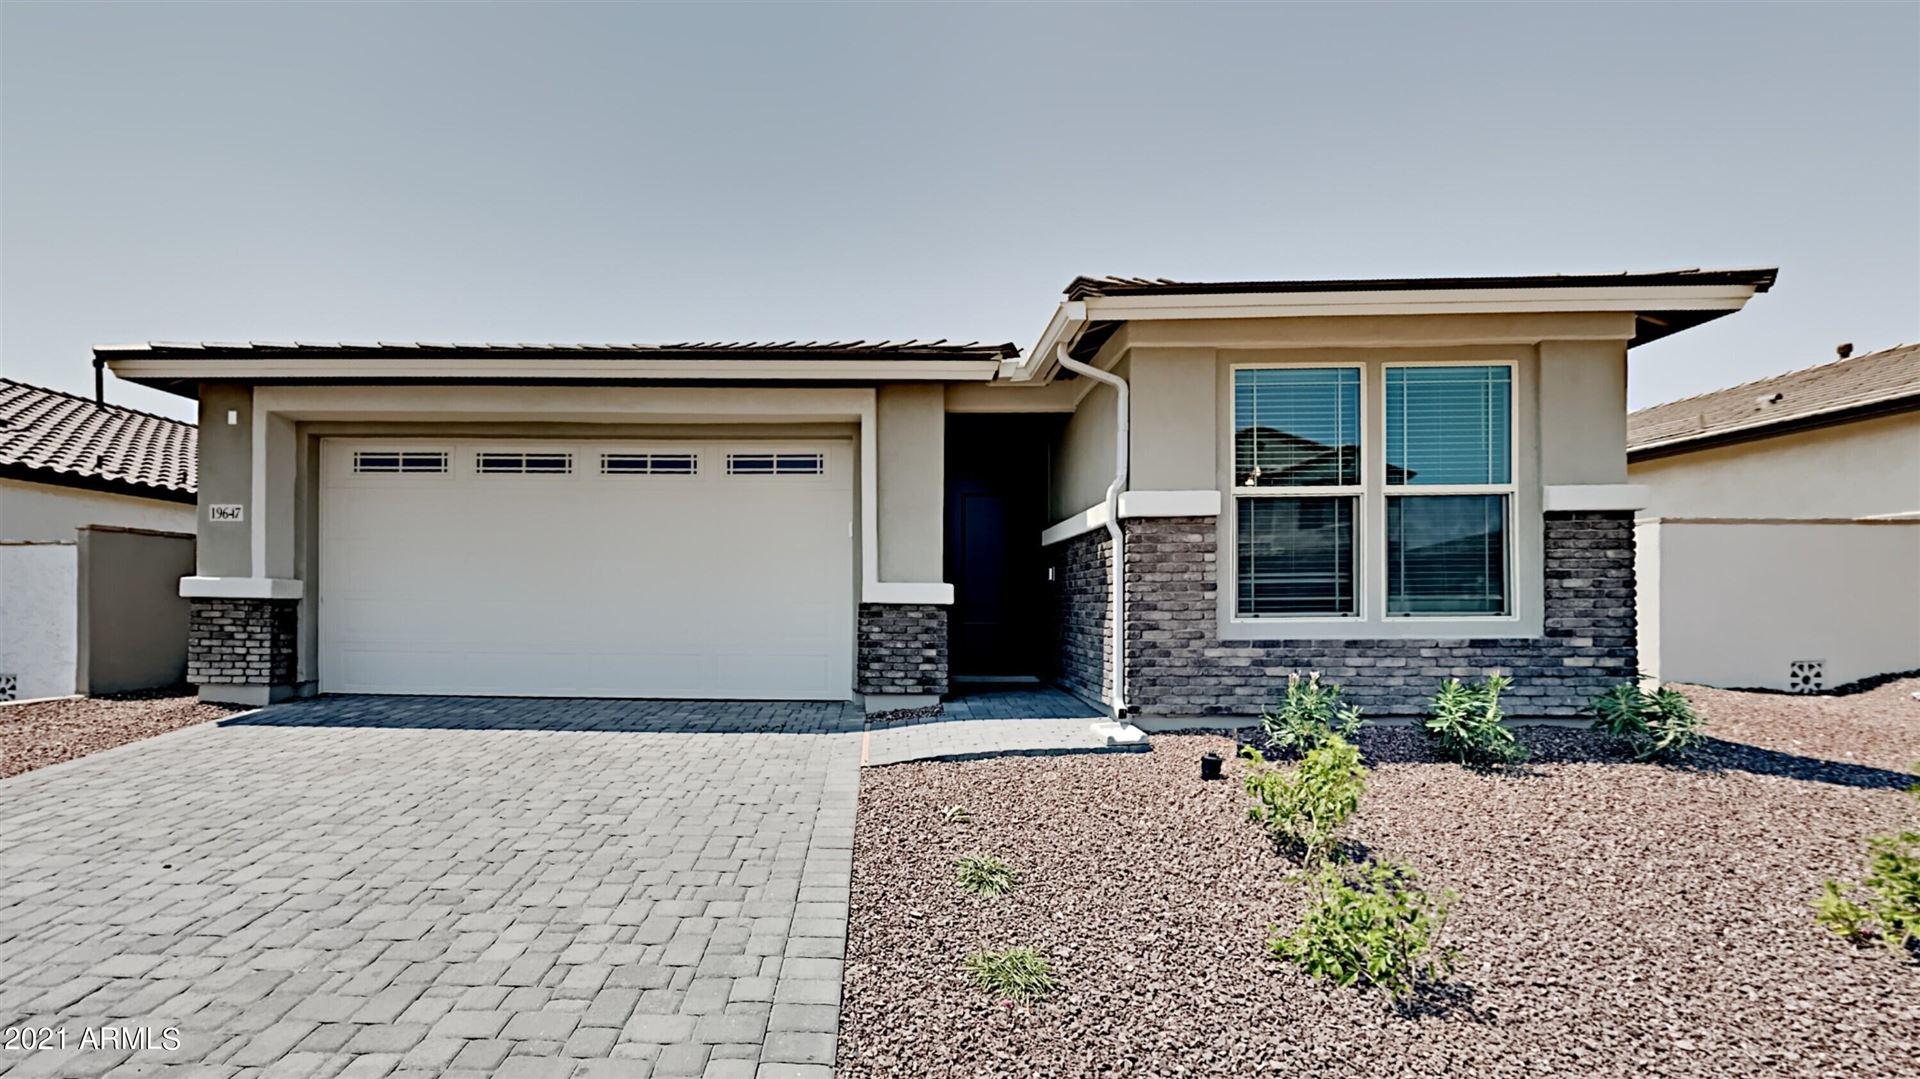 Photo of 19647 W Montecito Avenue, Litchfield Park, AZ 85340 (MLS # 6263878)